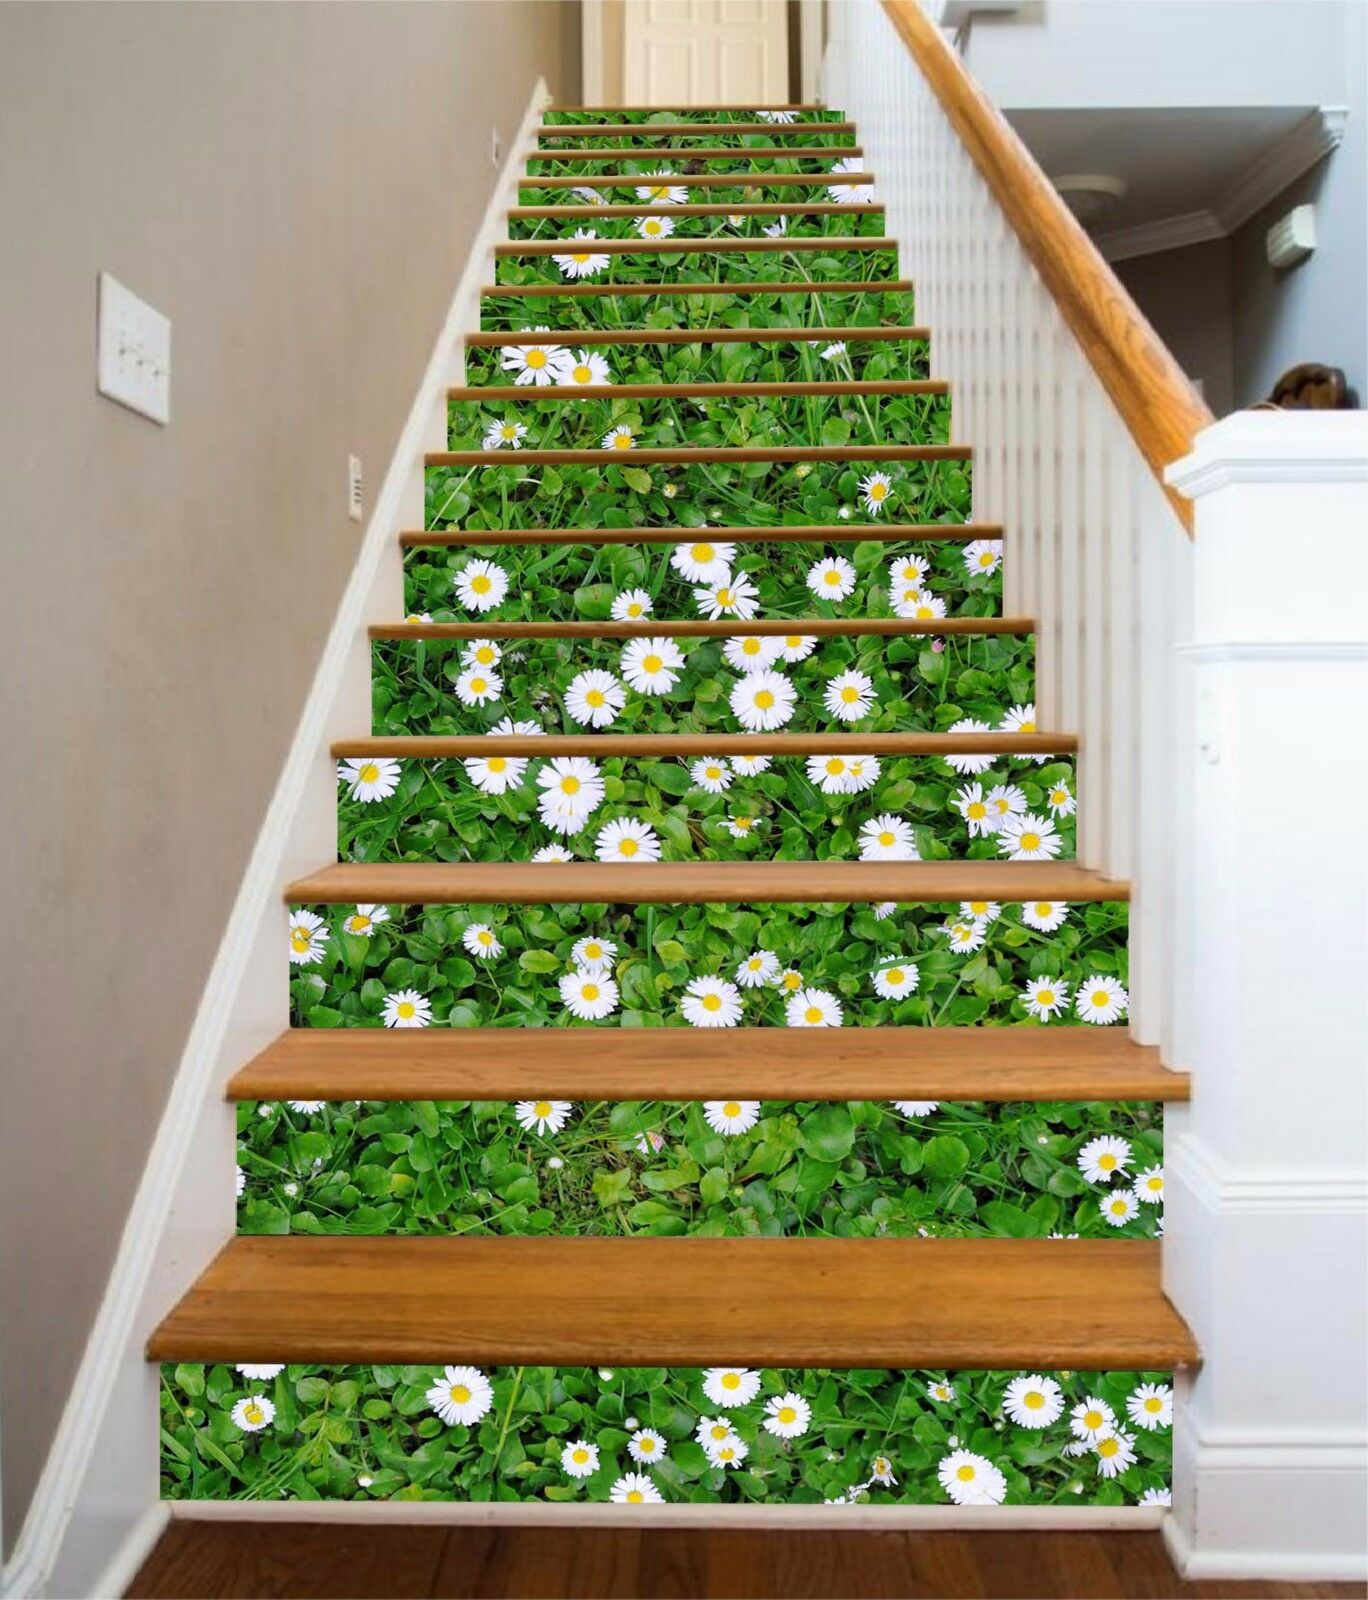 3D Grün lawn 6 Stair Risers Decoration Photo Mural Vinyl Decal Wallpaper UK